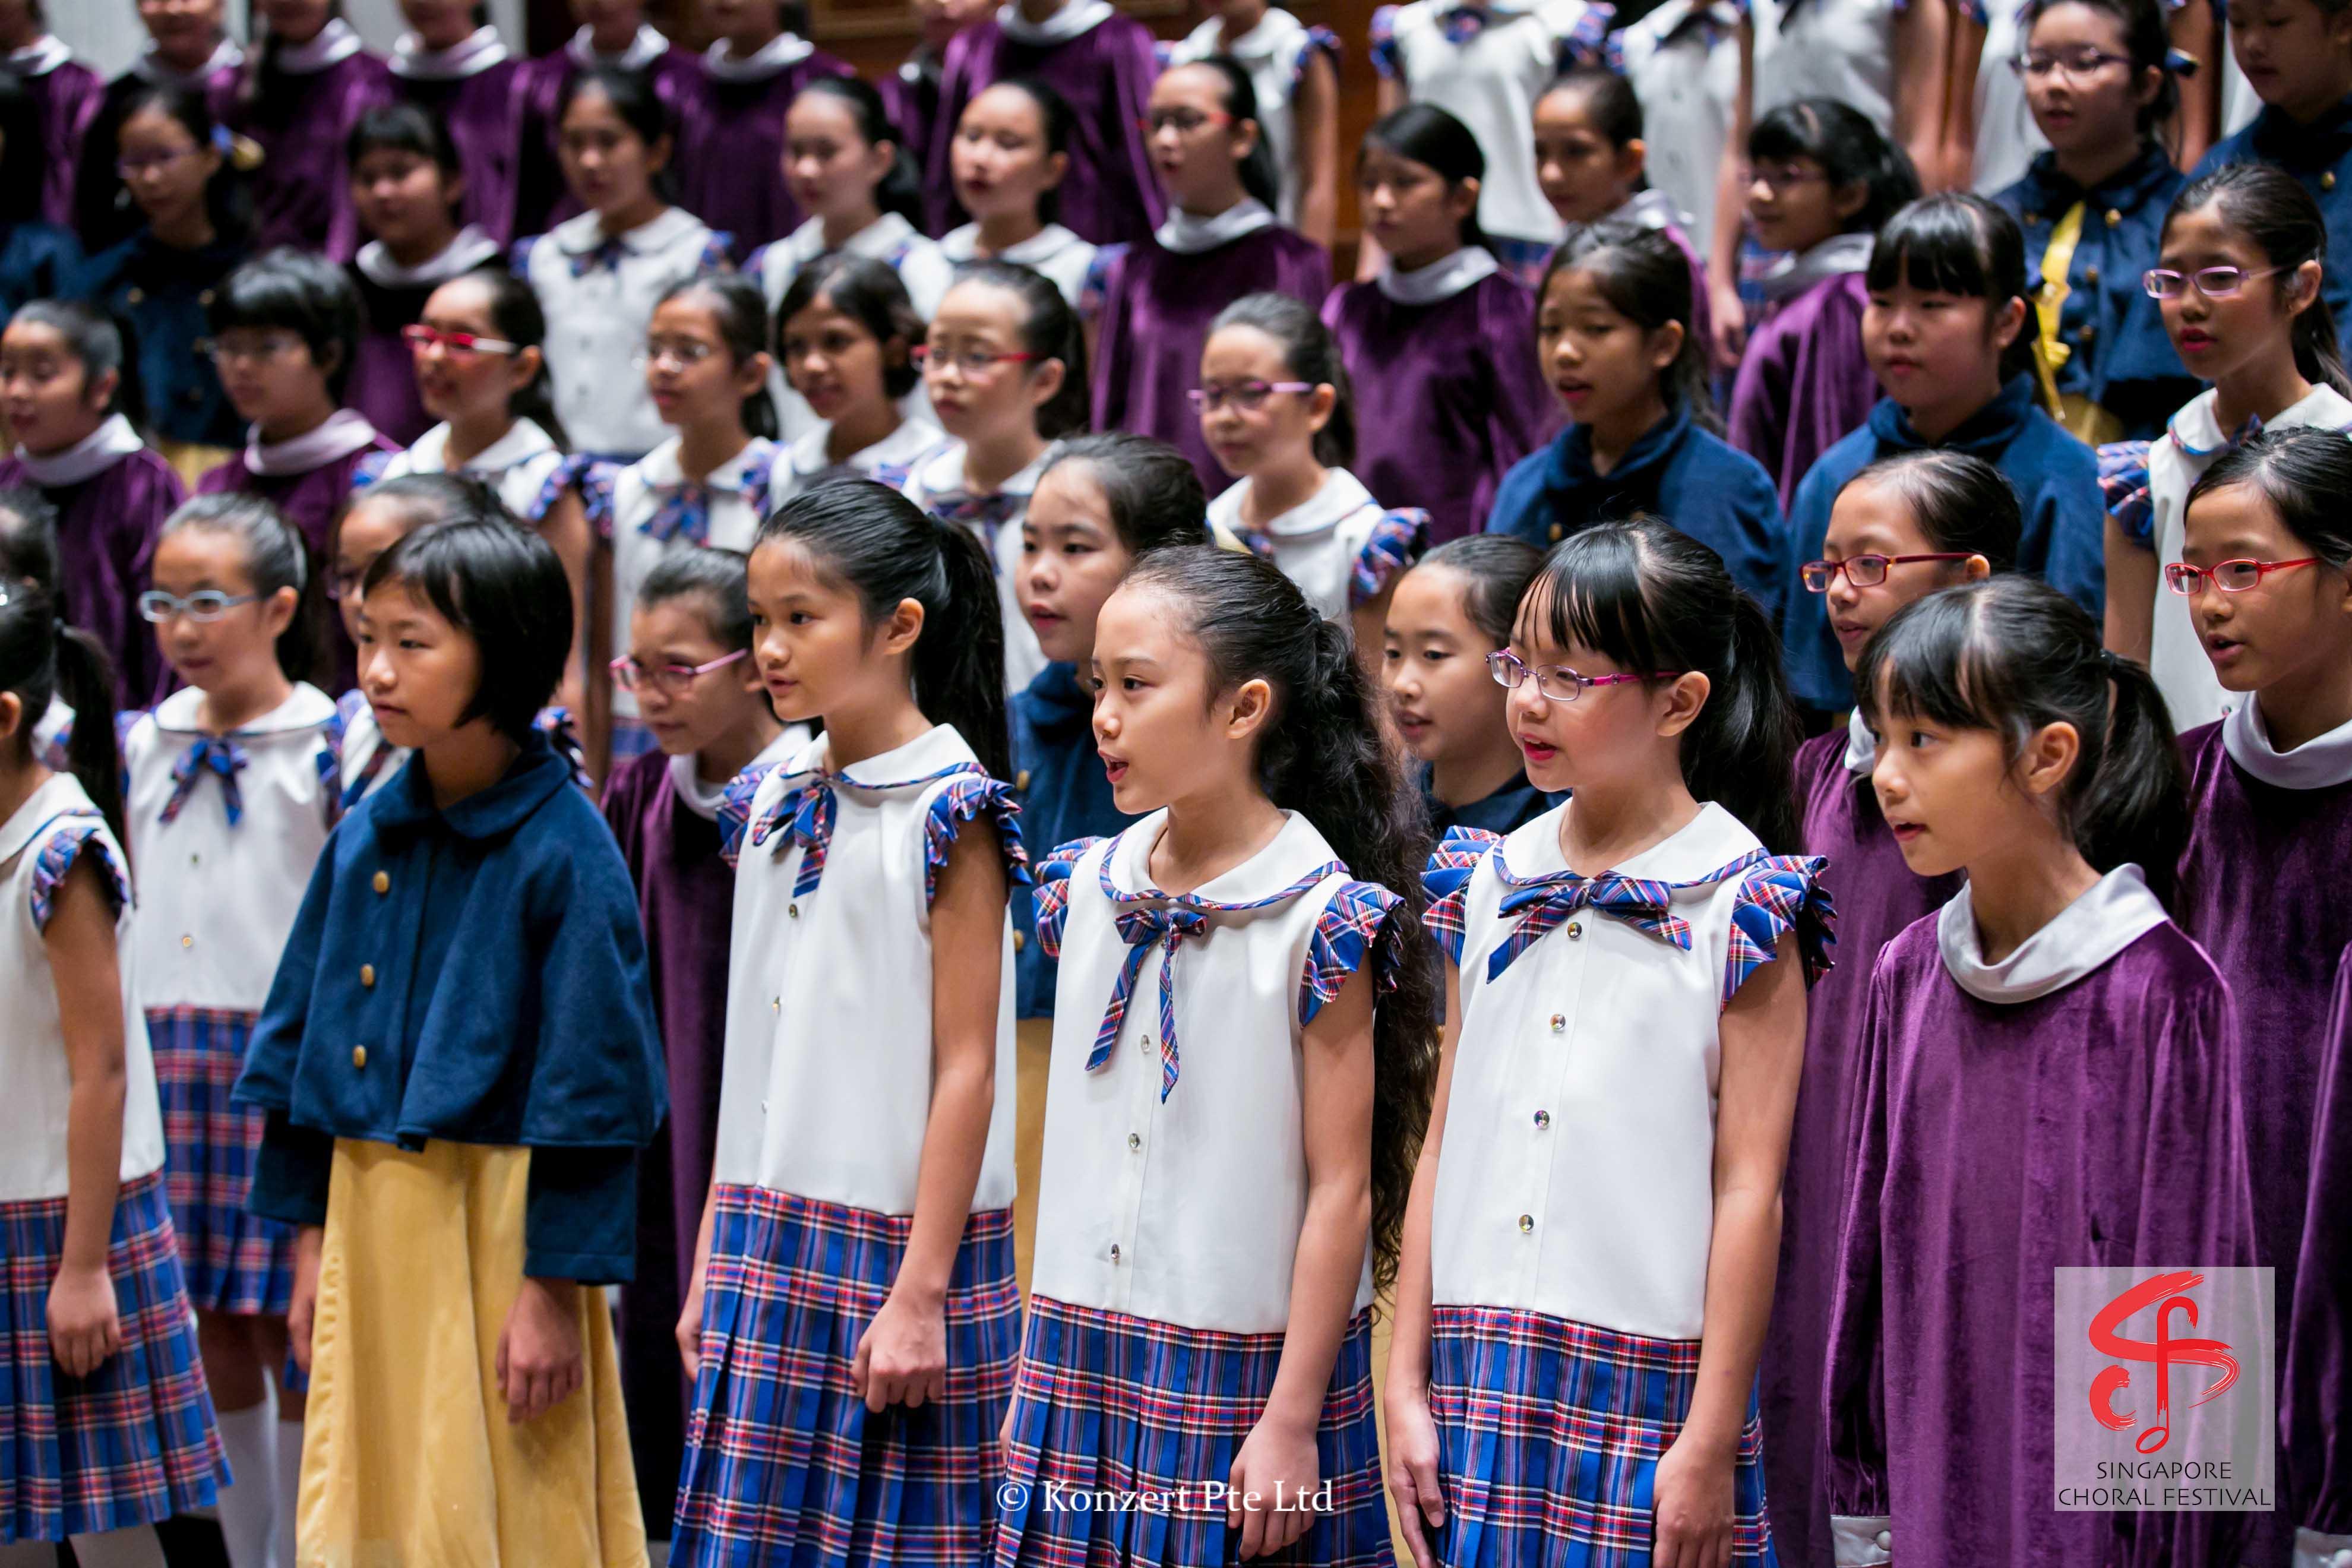 Singapore Choral Festival 8-8-15 (10).jpg